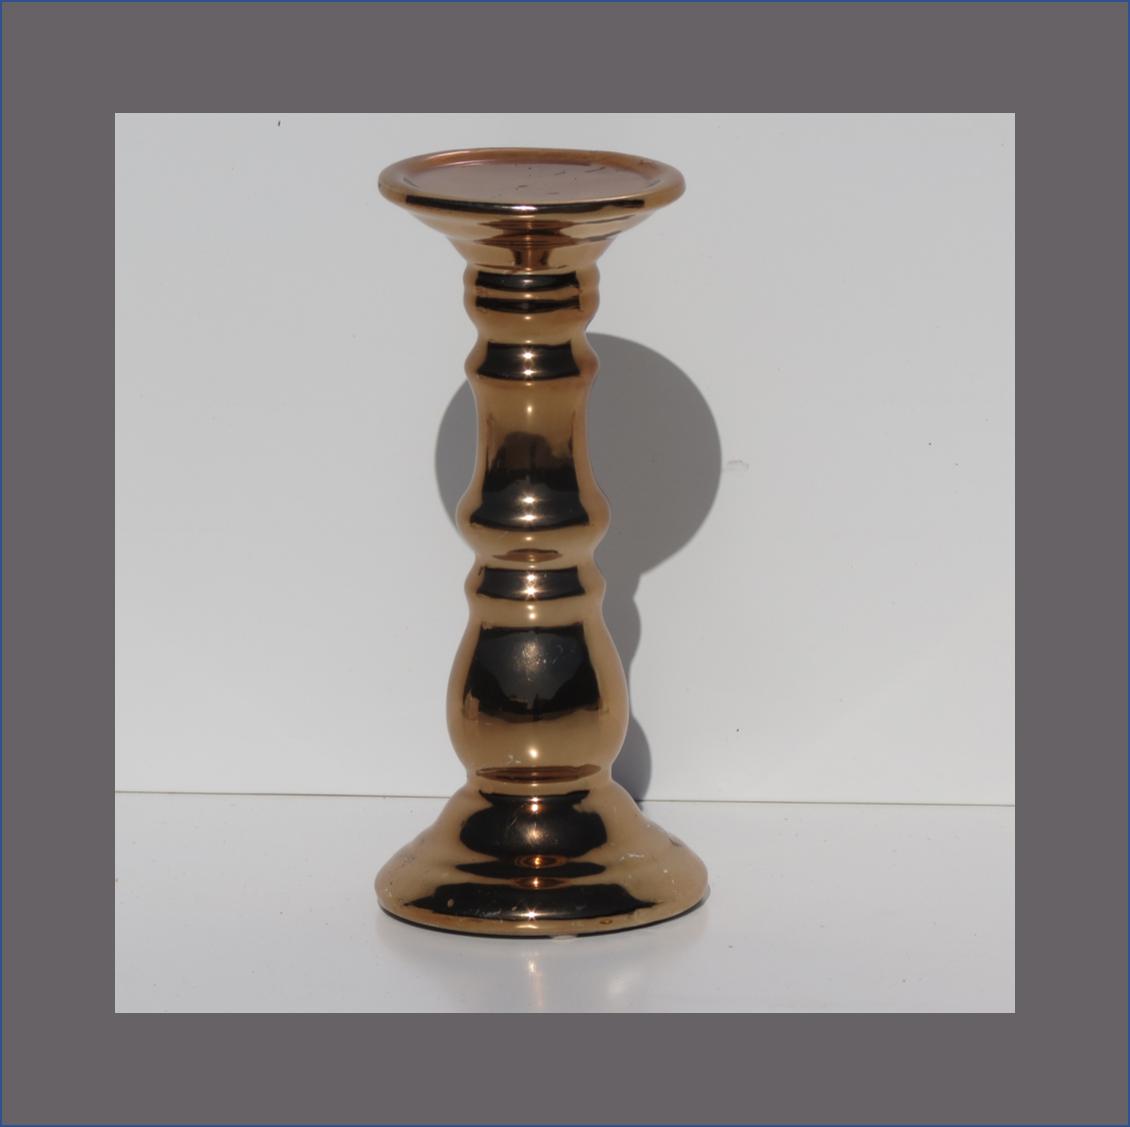 copper-ceramic-candle-stand